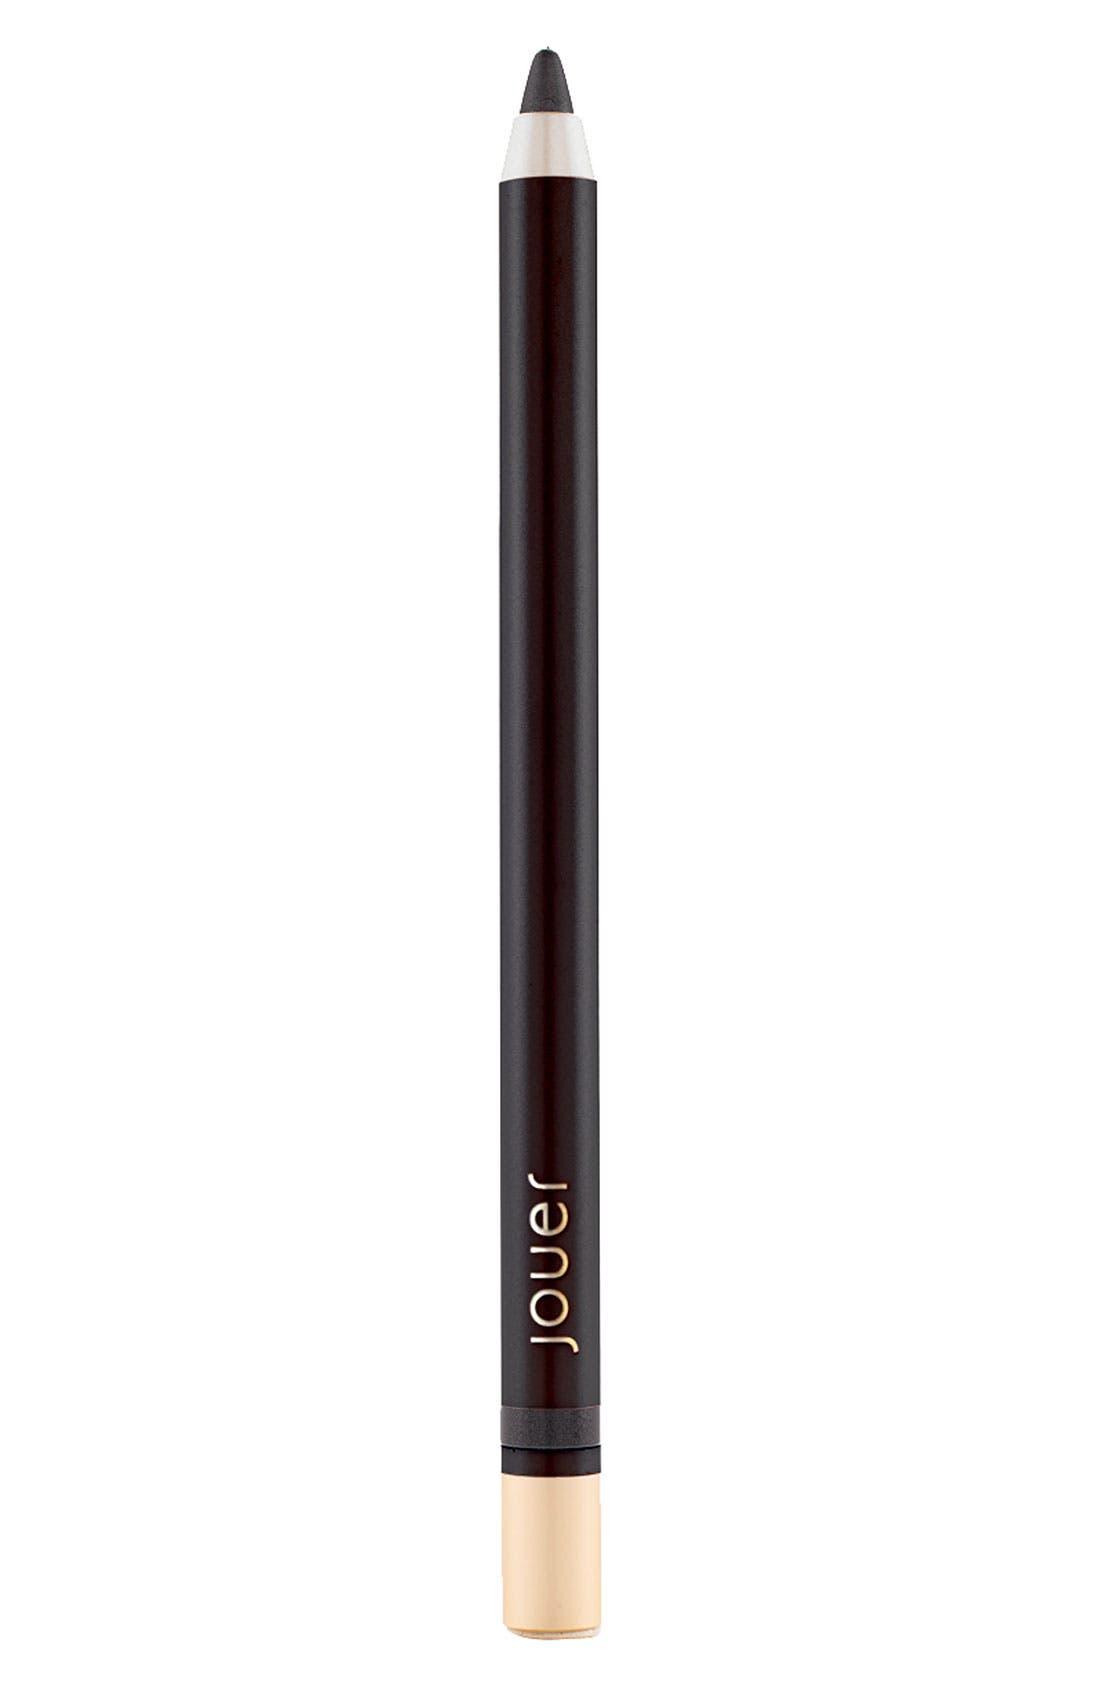 Jouer Eye Definer Pencil